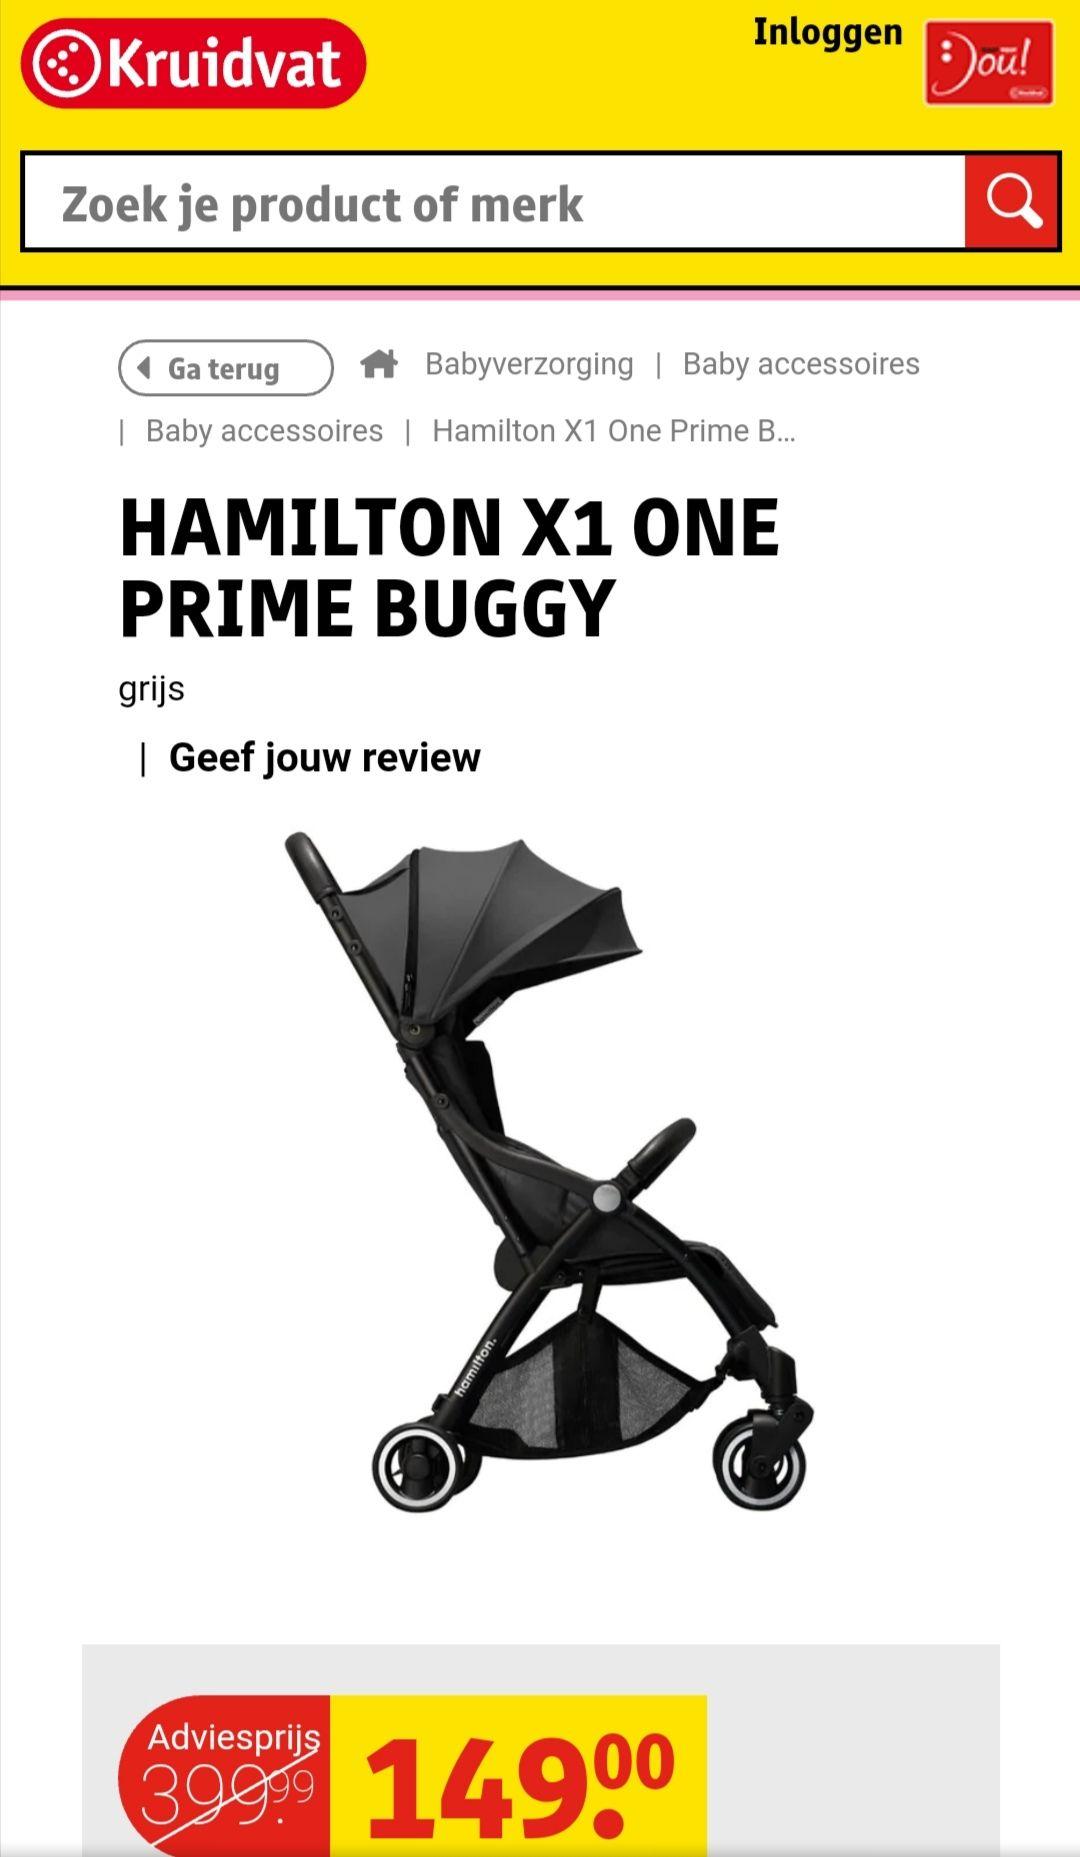 (kruidvat) Hamilton X1 One Prime Buggy